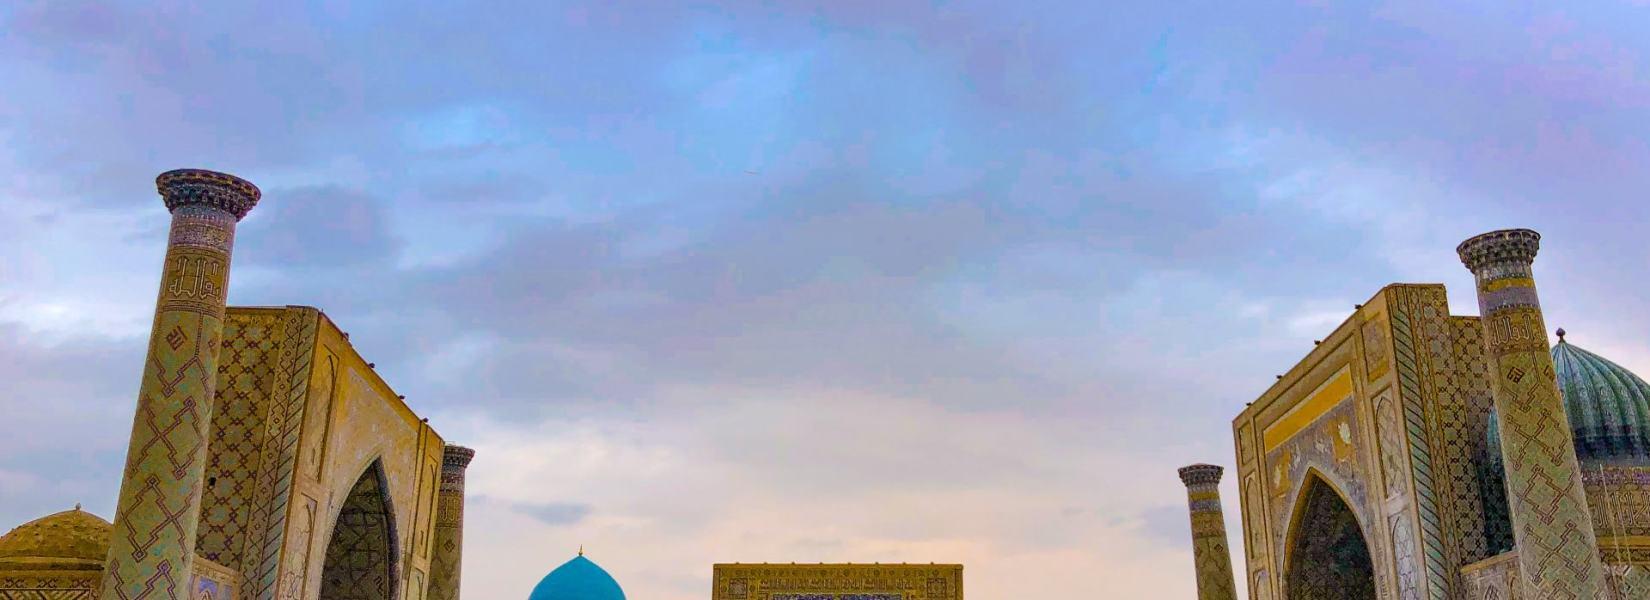 The Ultimate Uzbekistan Travel Guide 2020